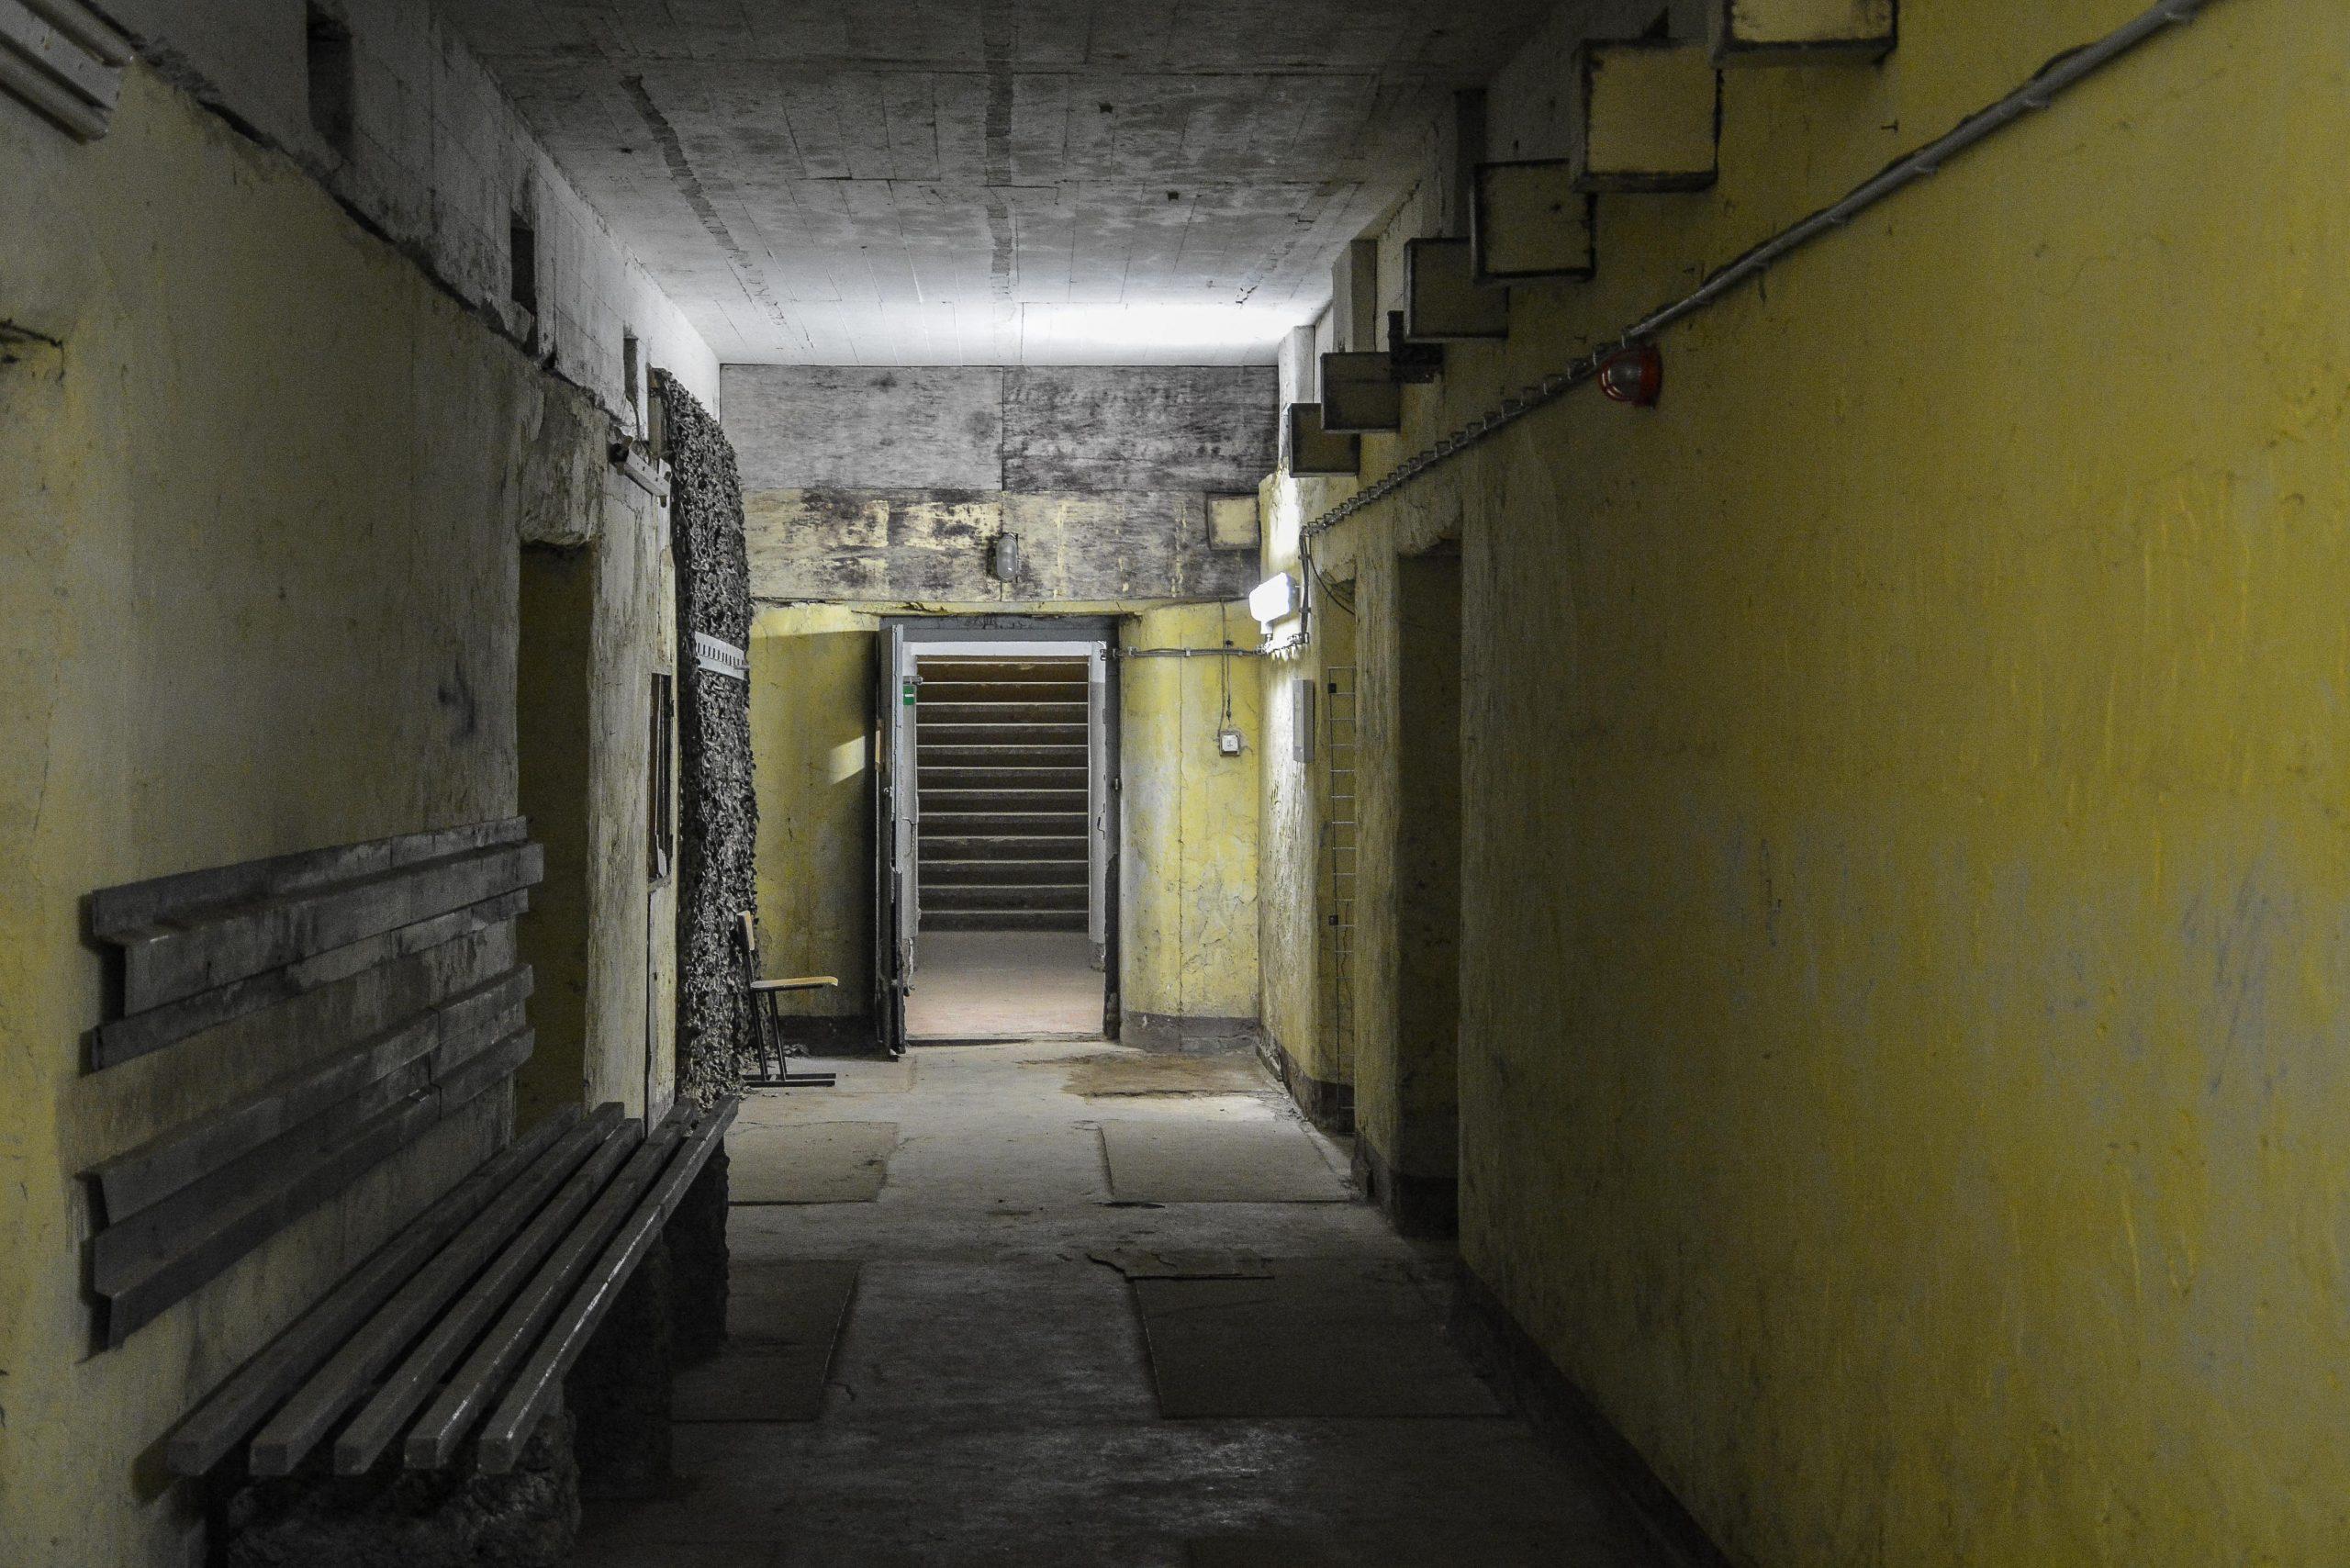 green bunker hallway bunker zeppelin amt 500 maybach bunker ranet wehrmacht sowjet soviet military zossen brandenburg germany lost palces urbex abandoned